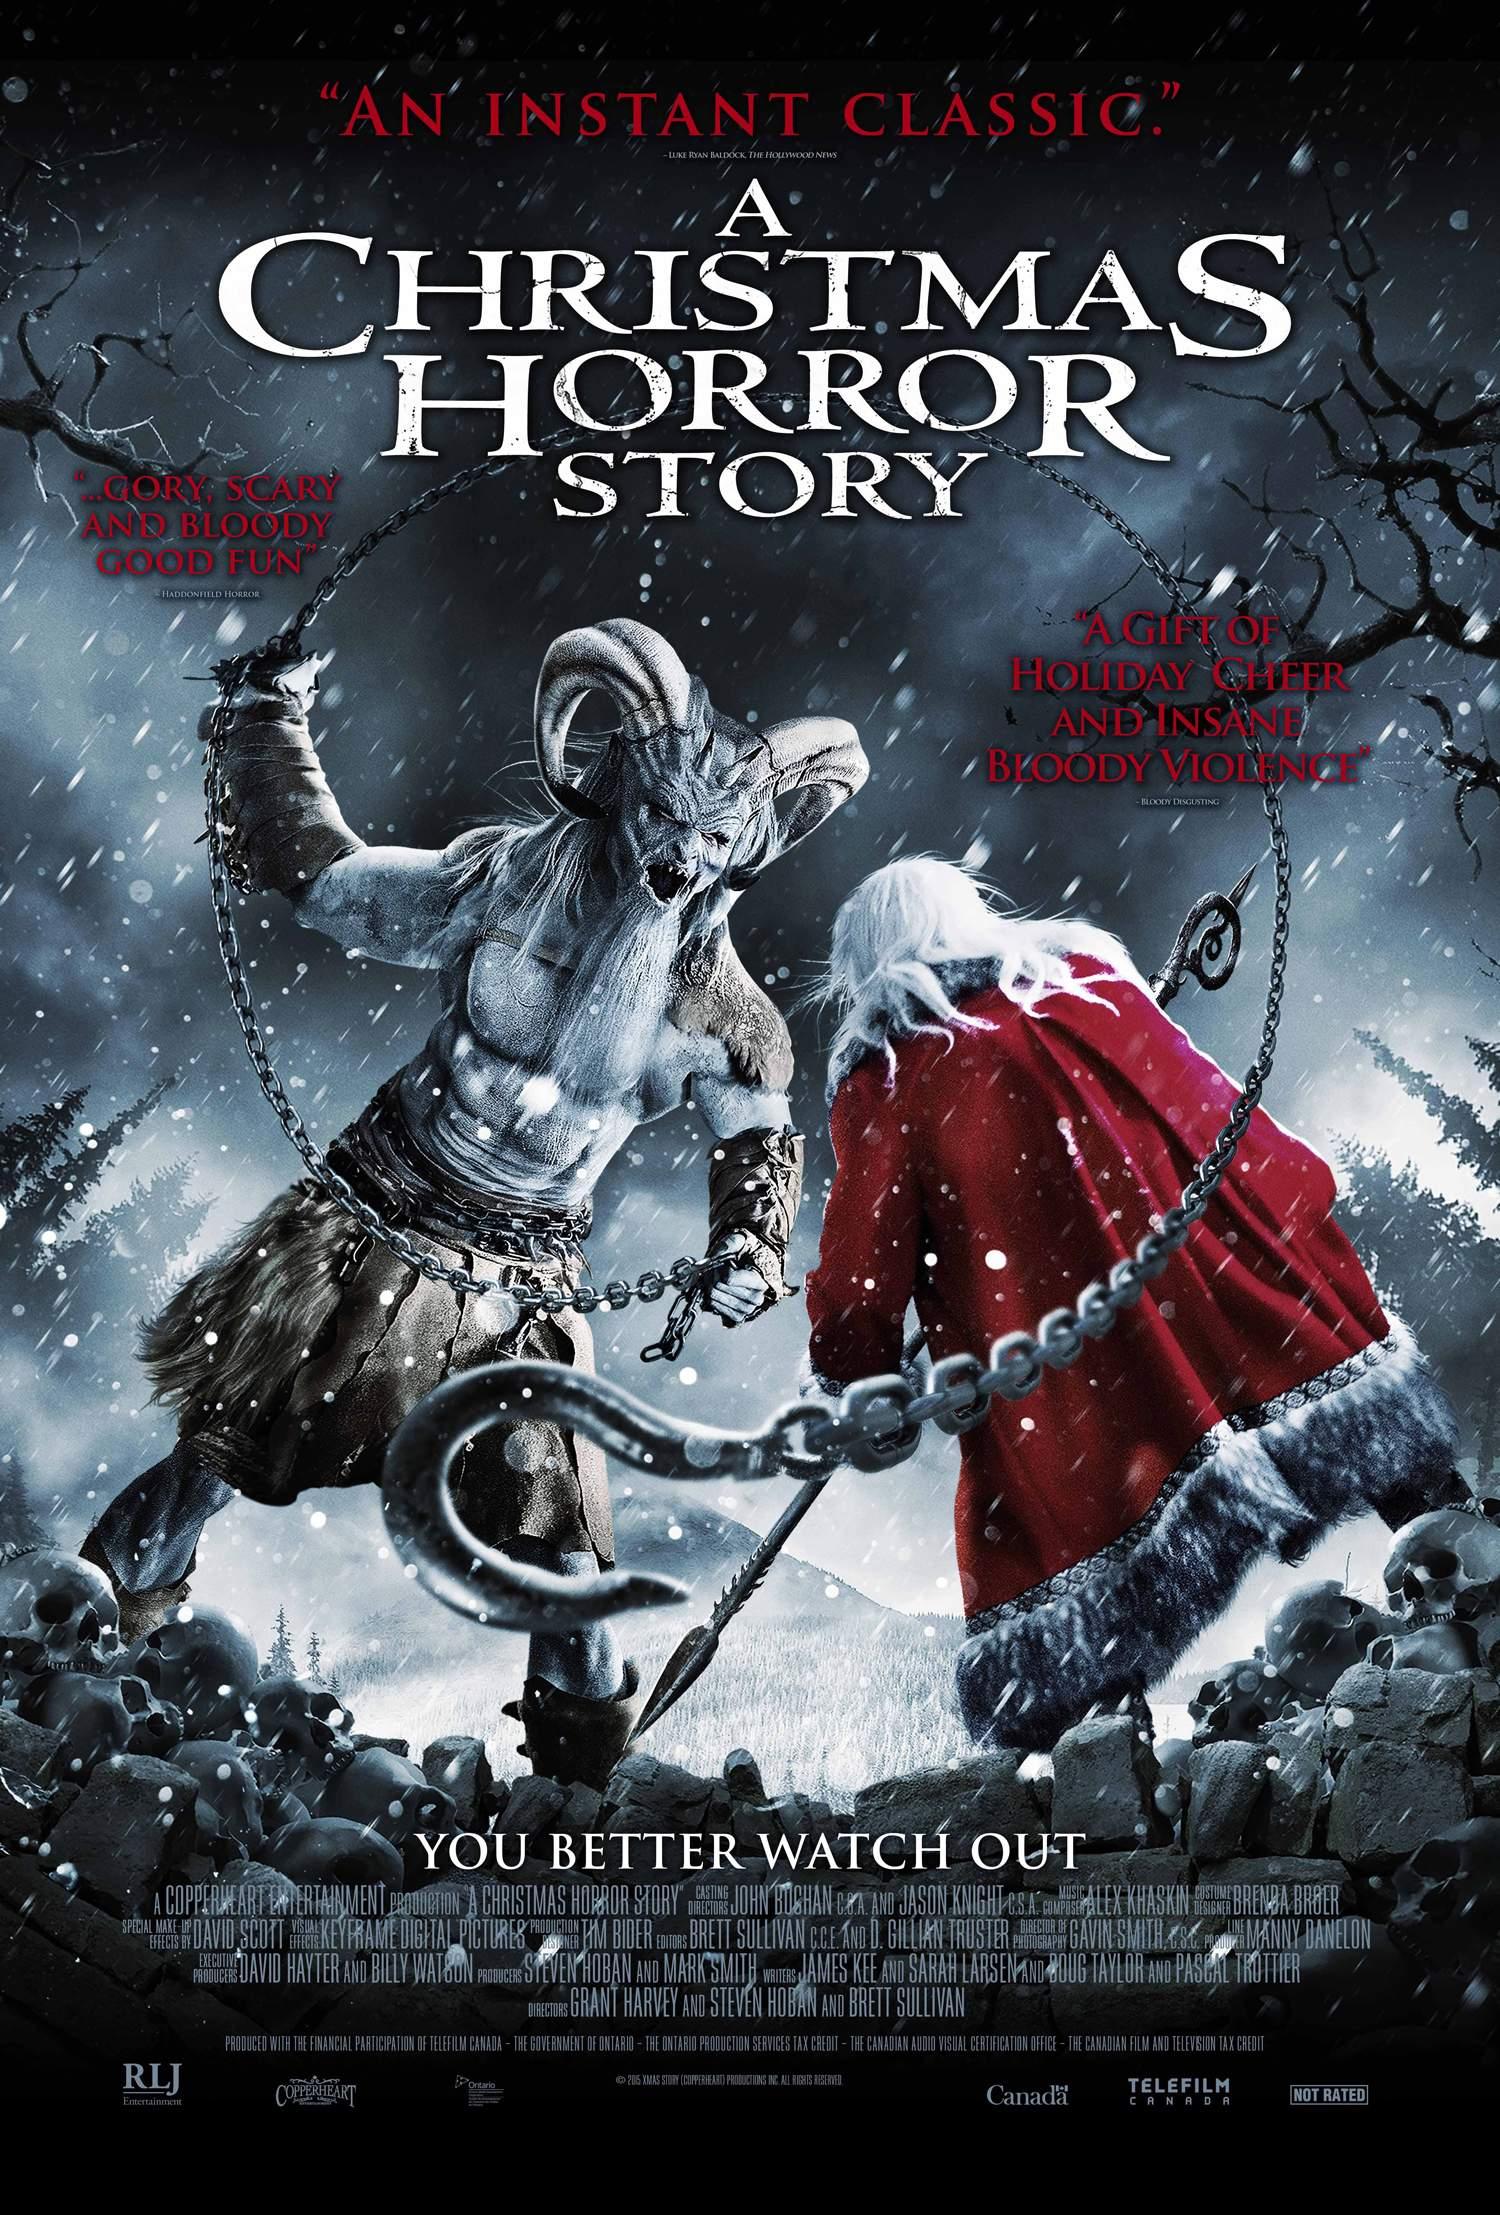 Celluloid Terror: Horror Stories (DVD Review